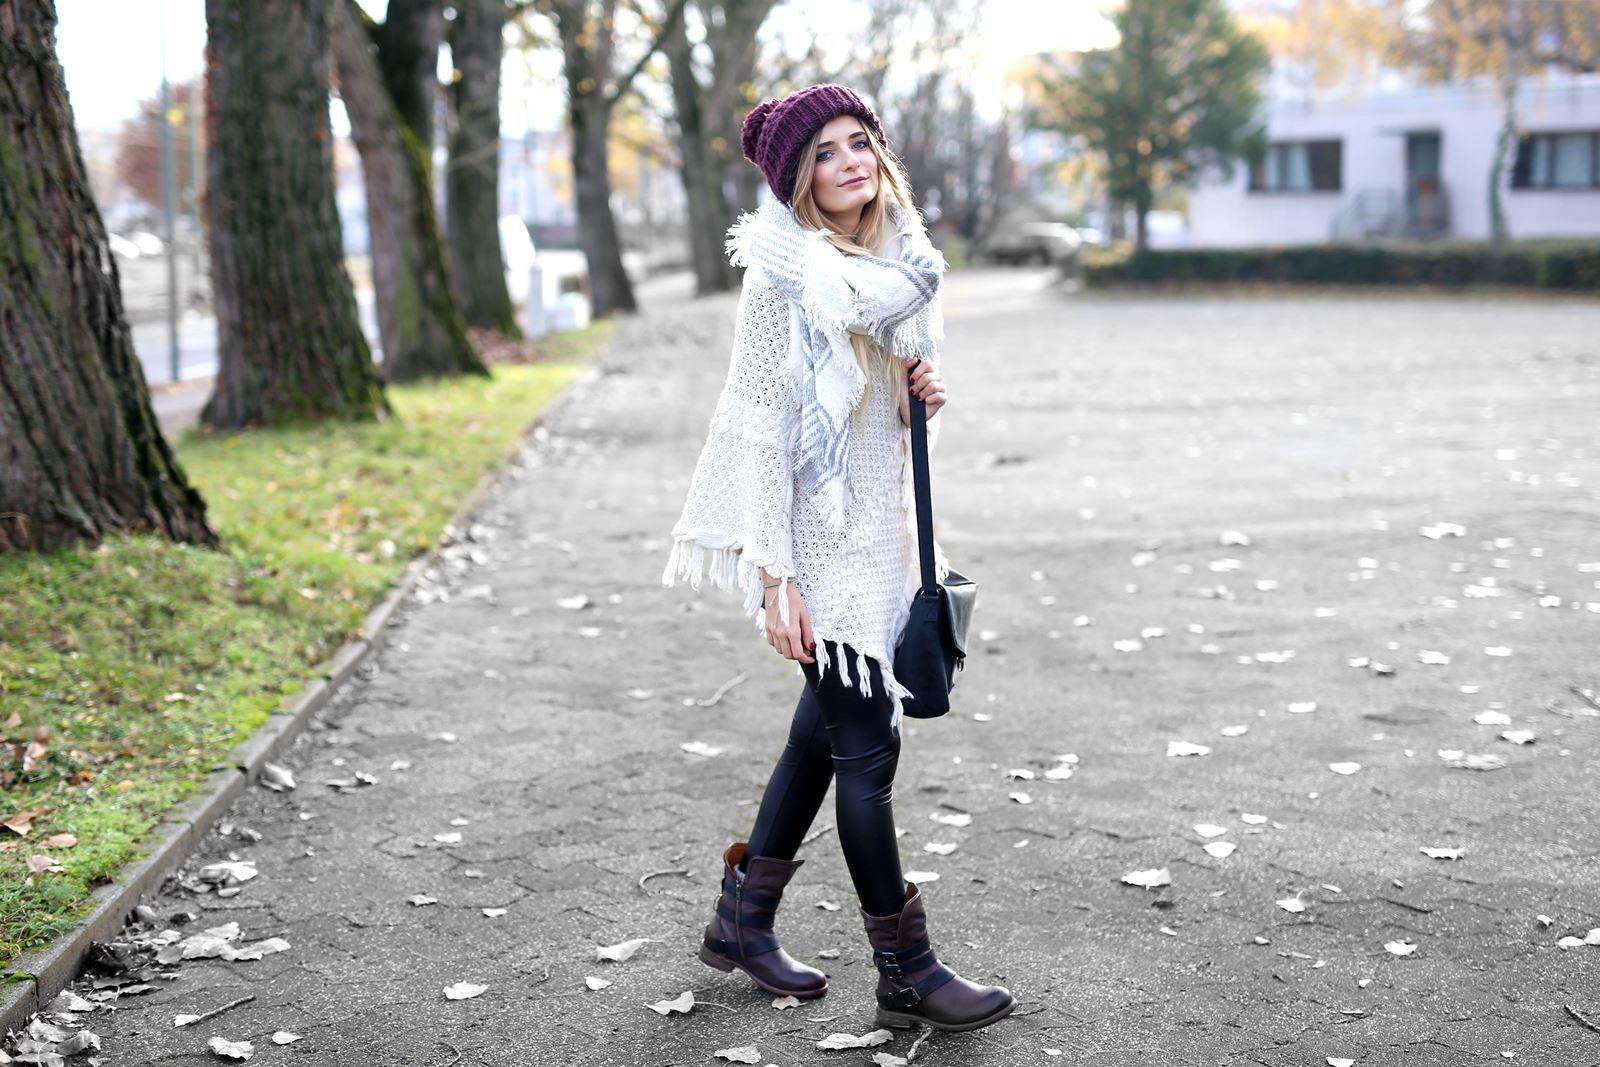 modeblog-german-fashion-blog-herbst-outfit-poncho-xxl-schal-2